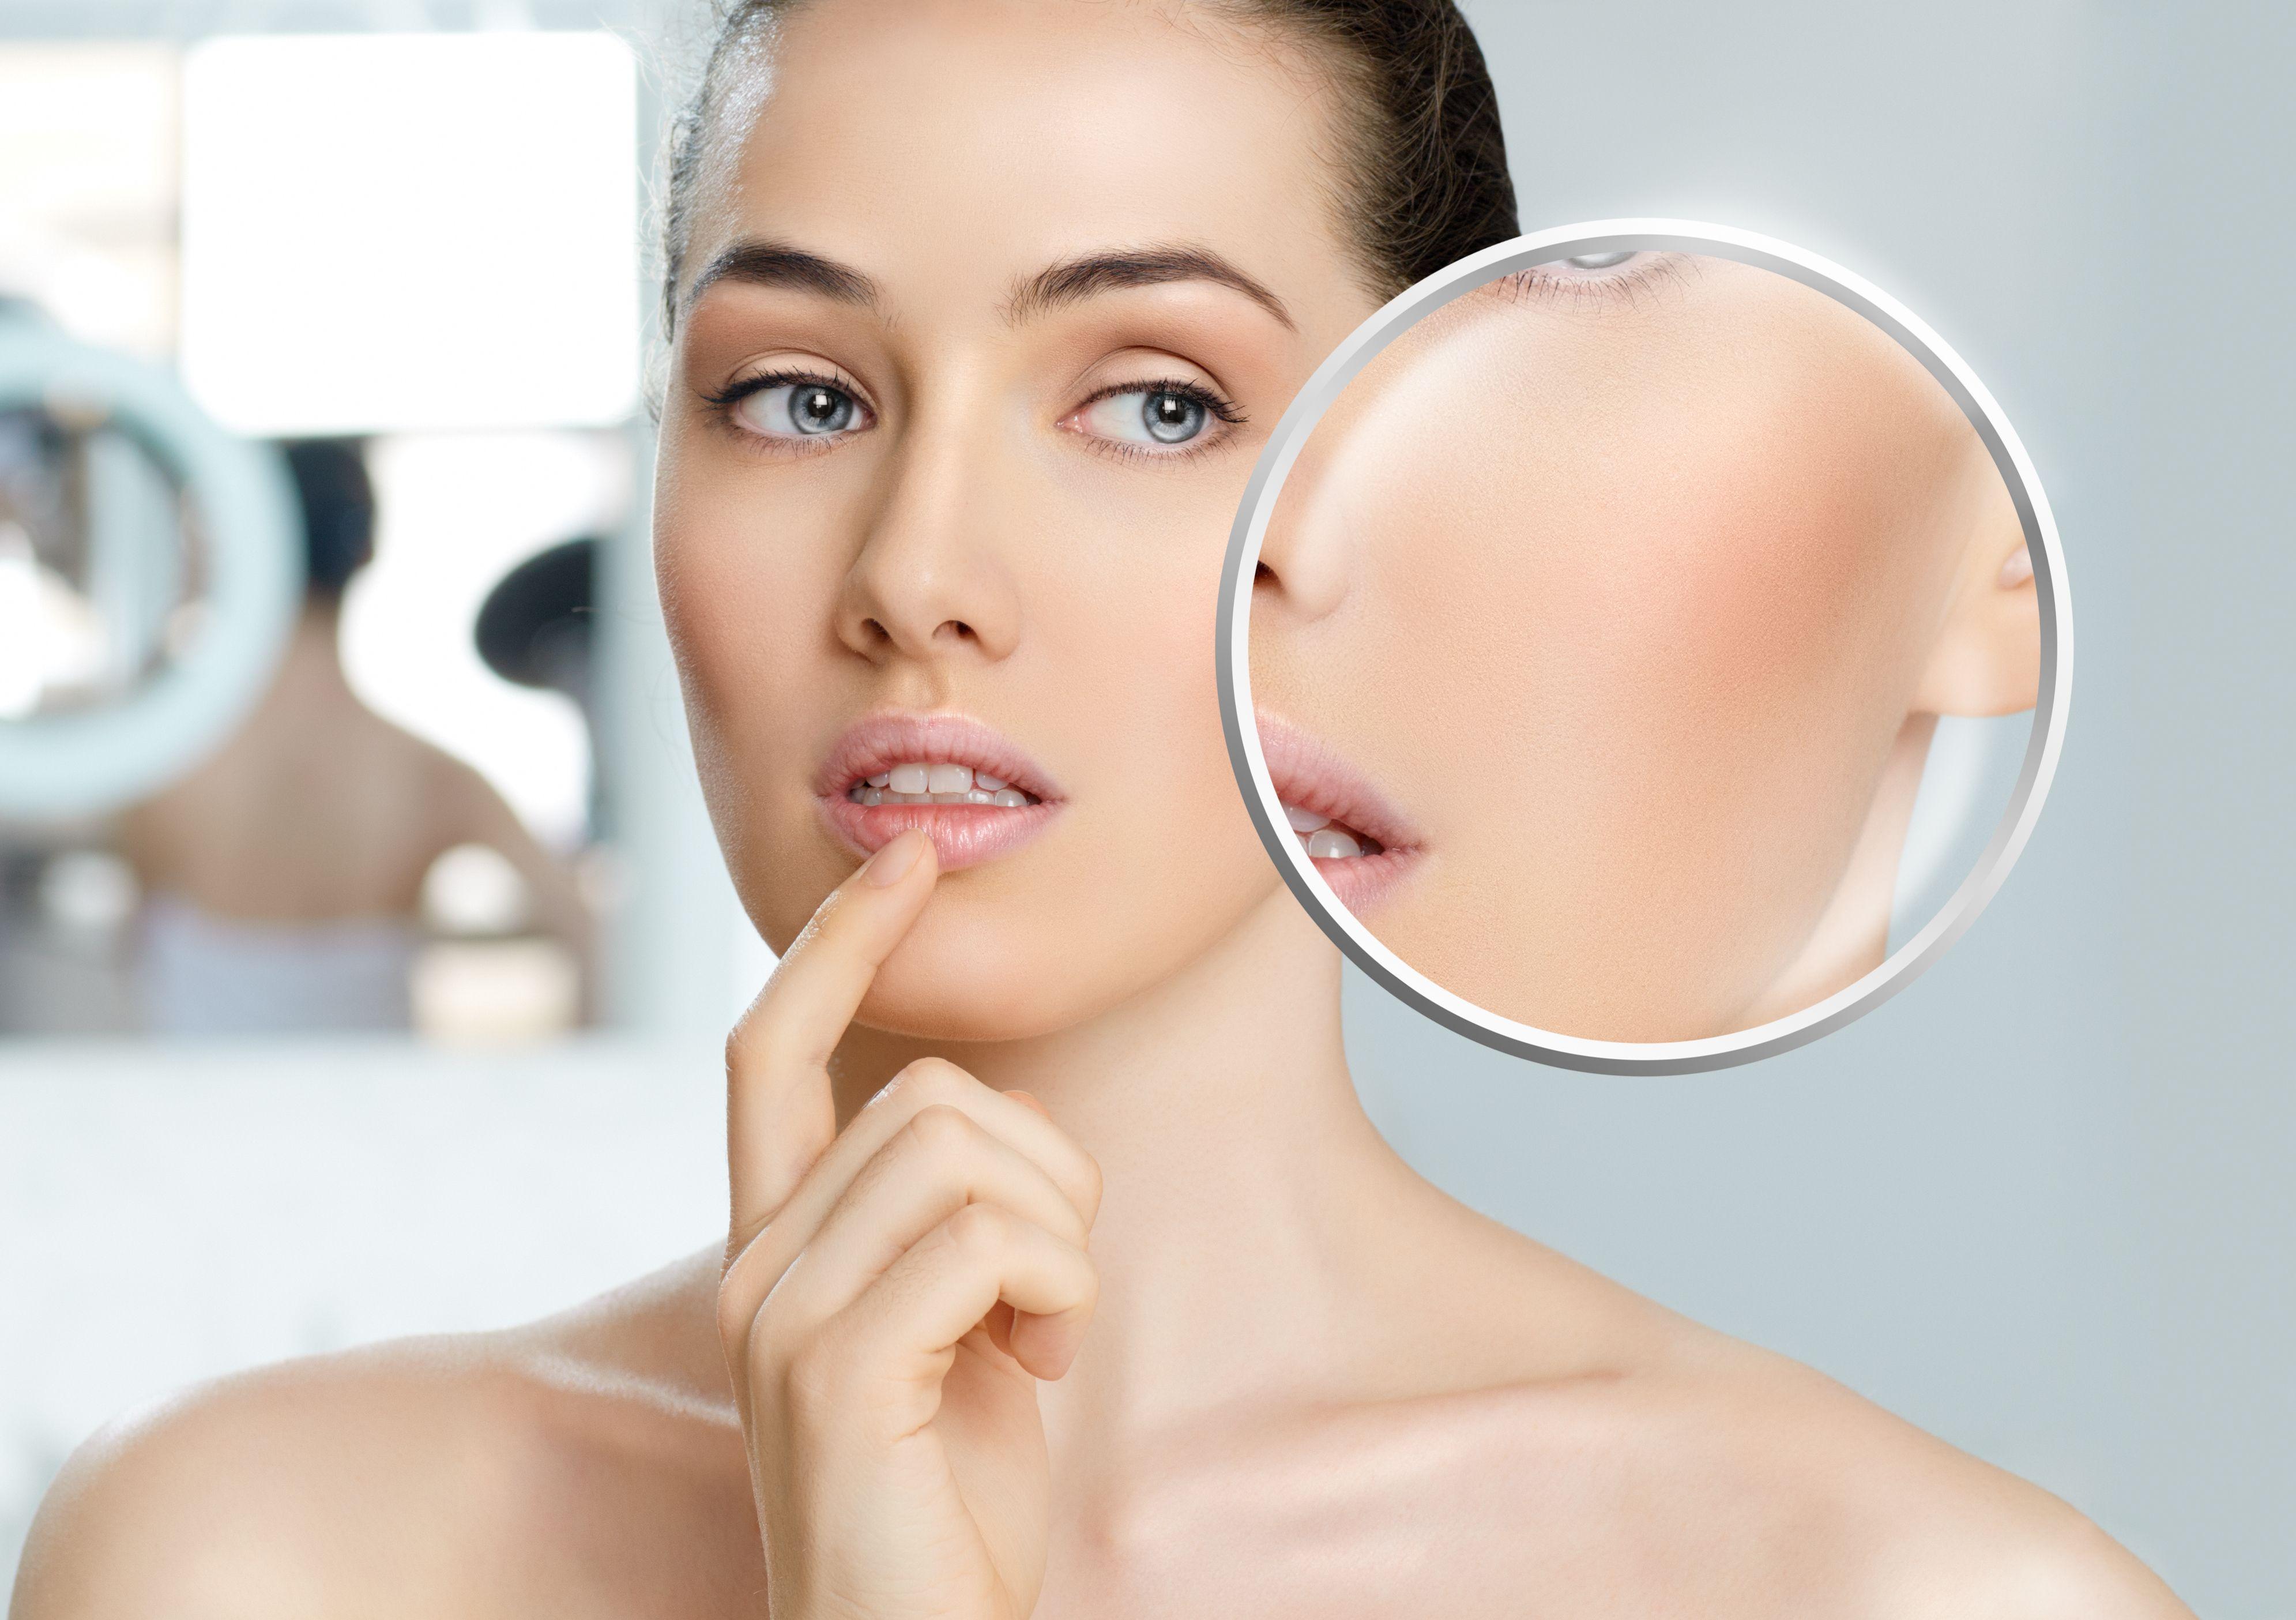 Botox: Servicios  de Centro de Ginecología y Medicina Estética Nervión